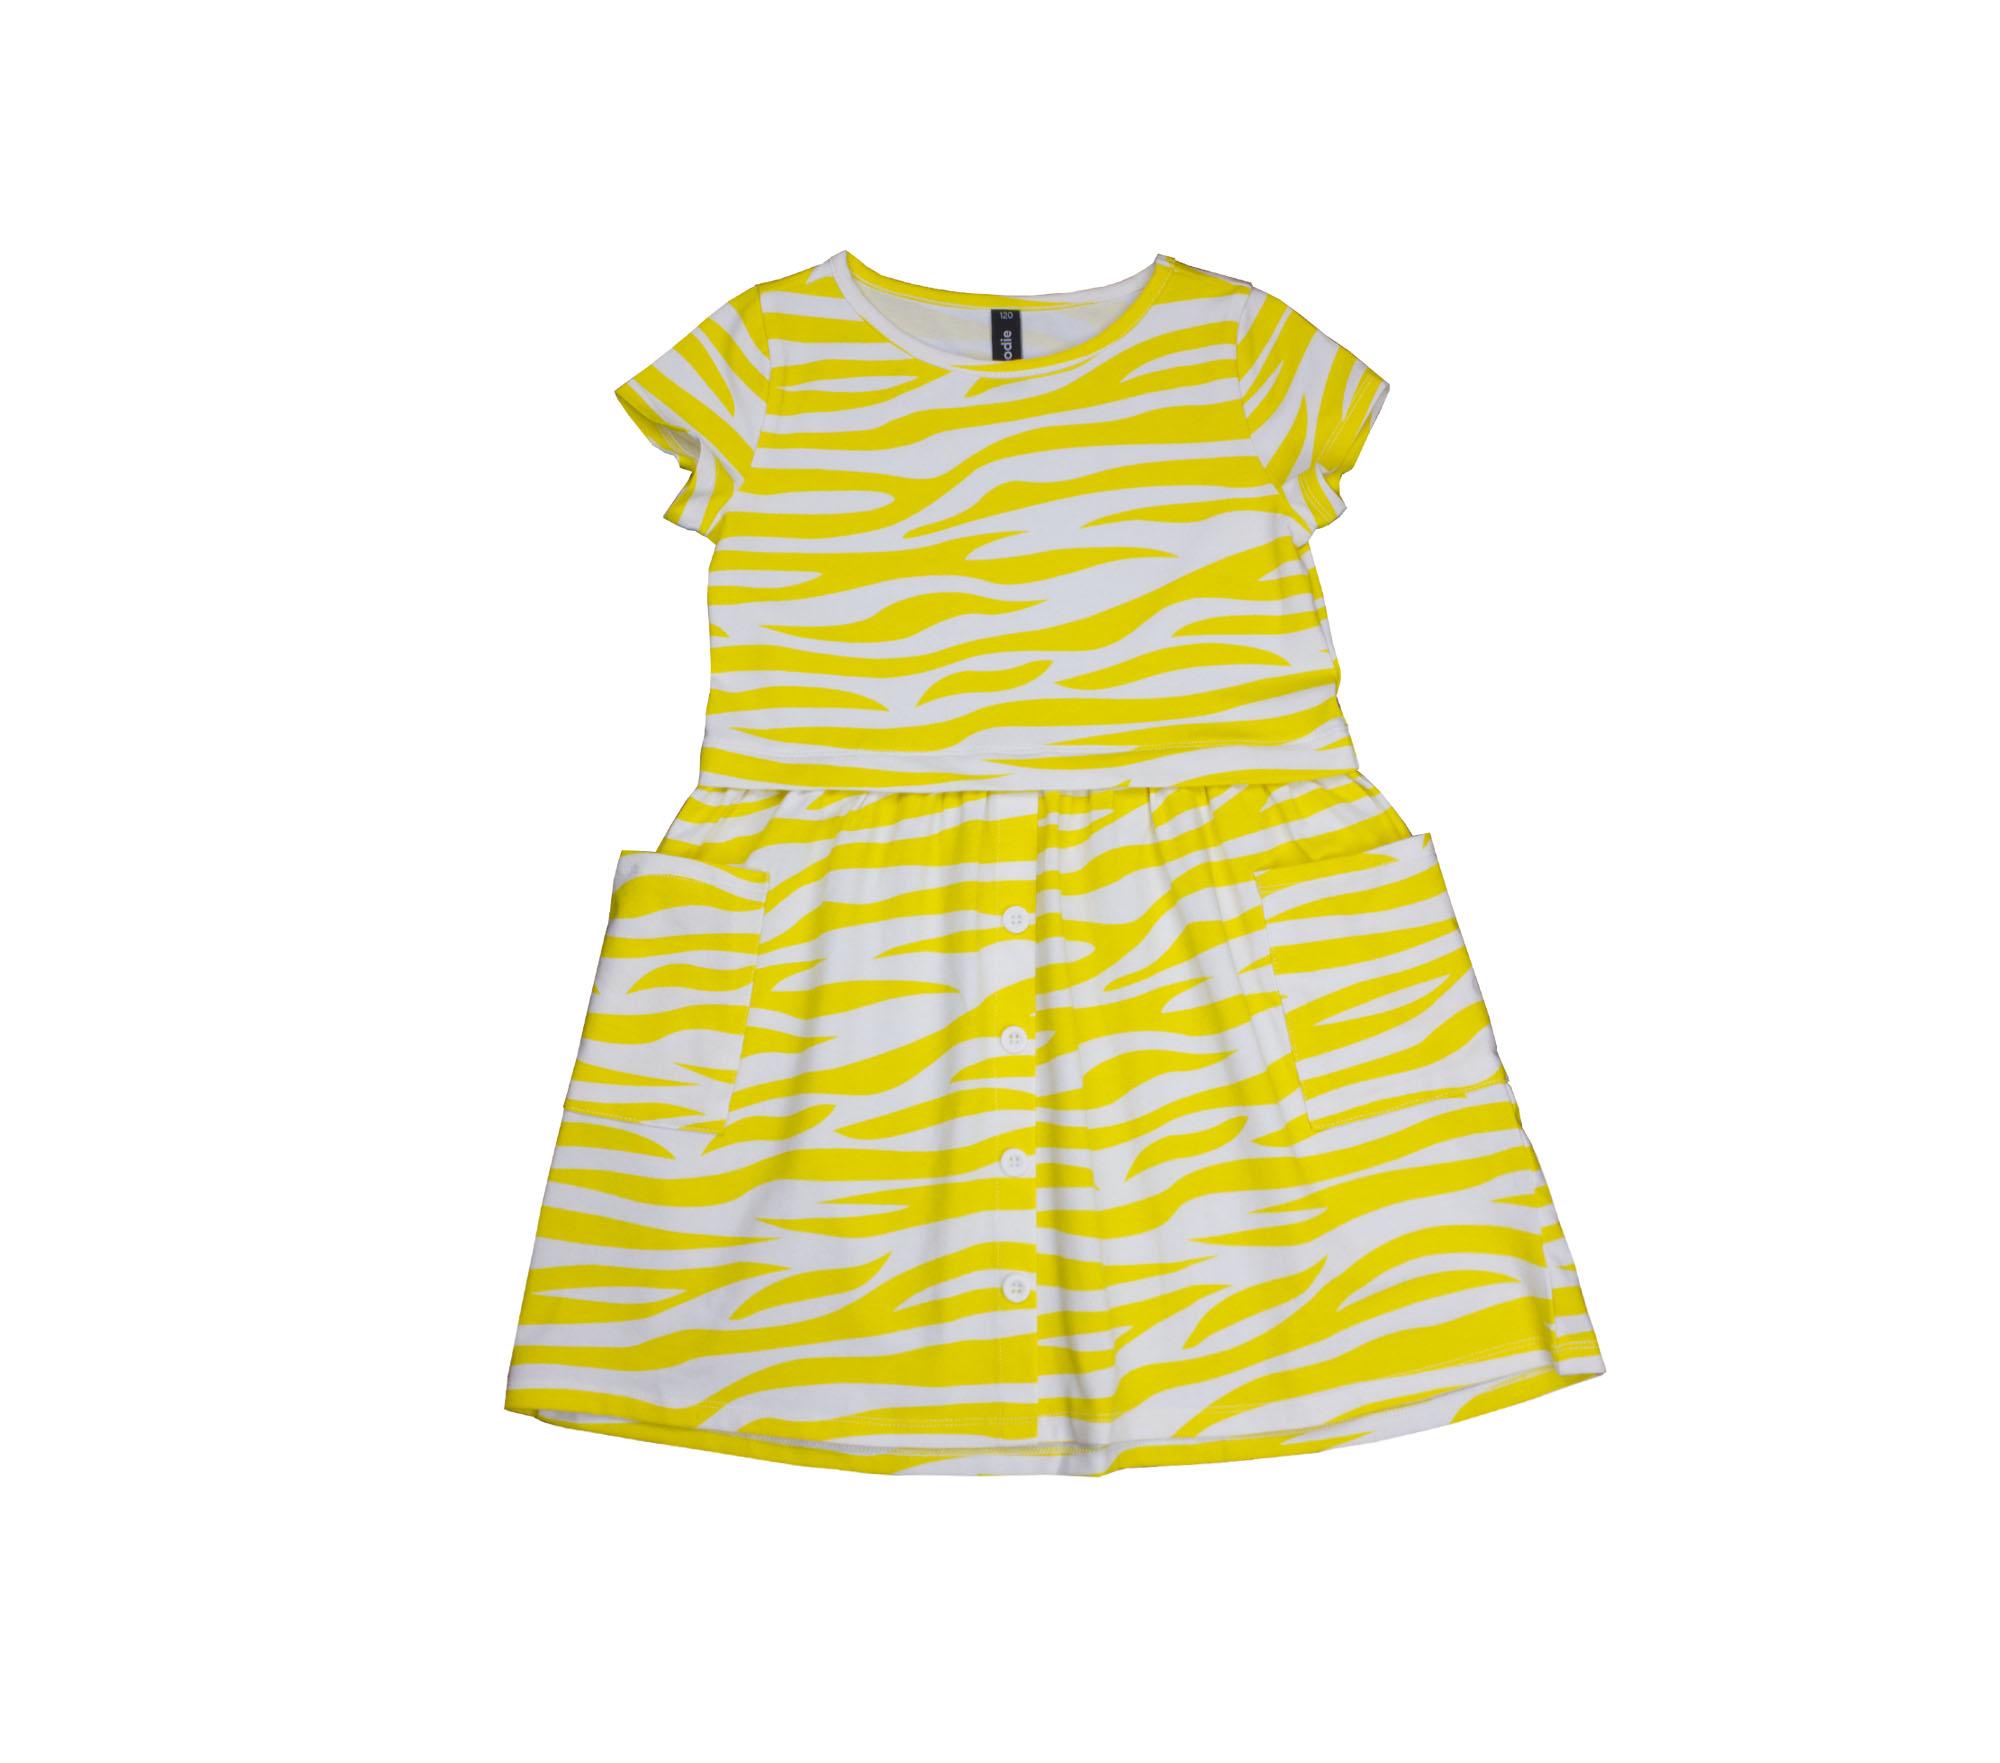 Klänning barn gul zebra – Bonnie